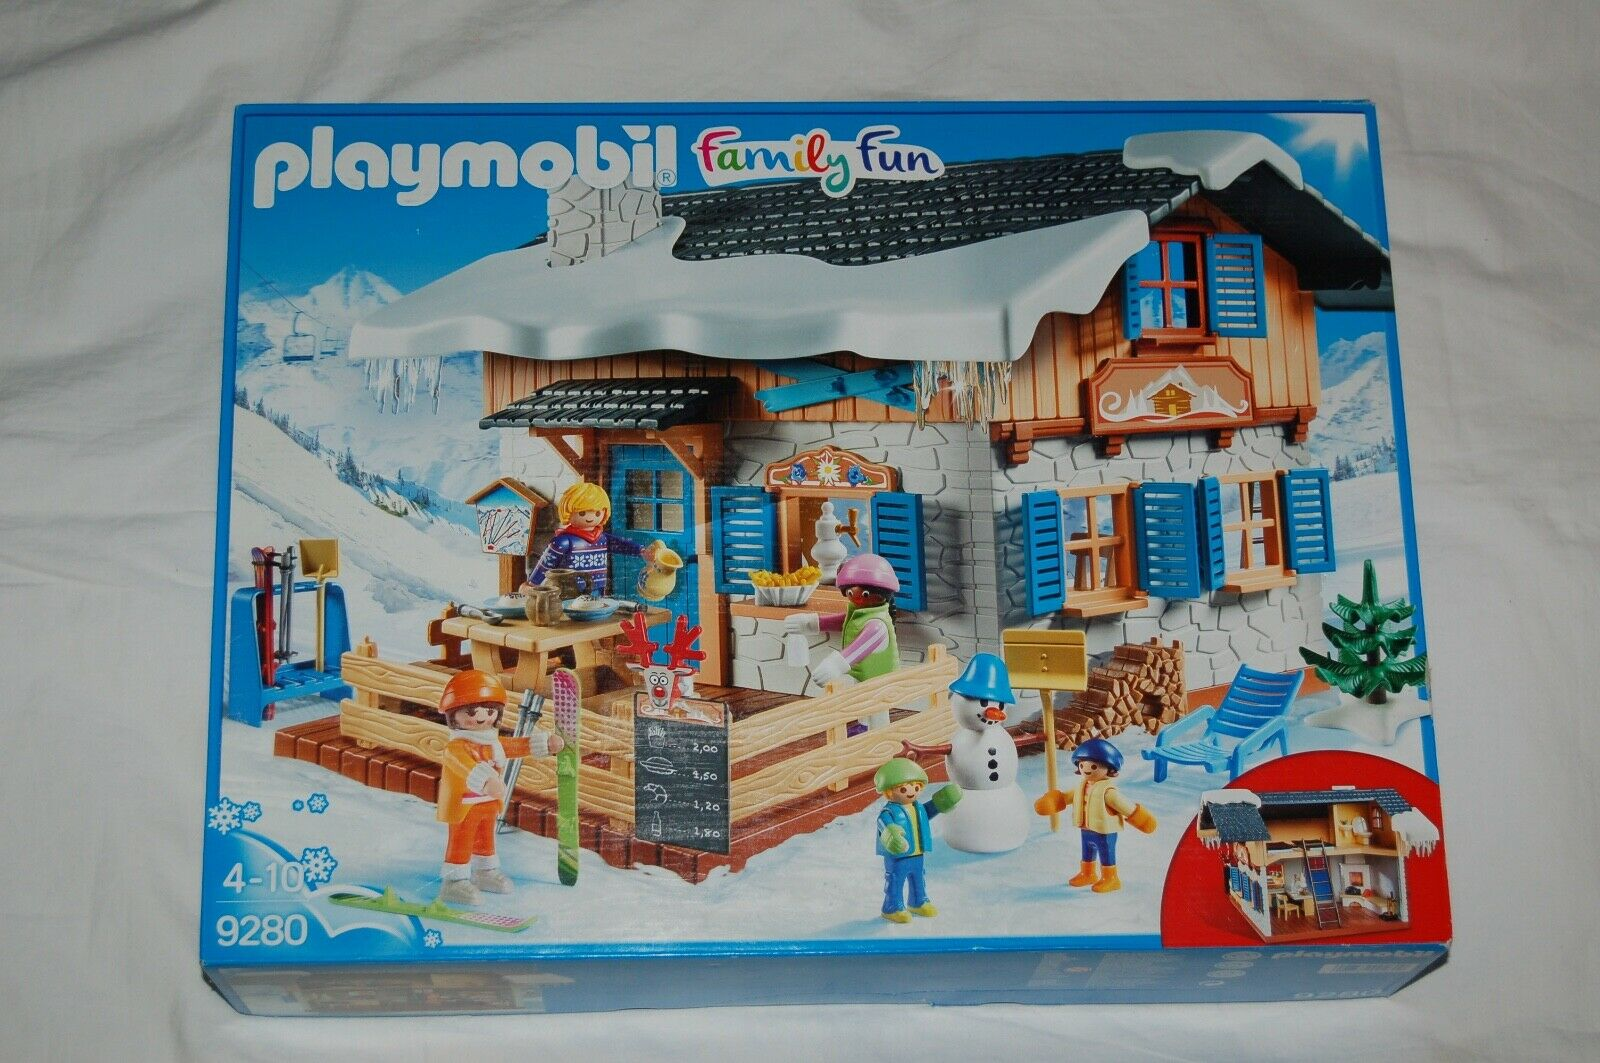 Playmobil Family Fun 9280 Skihütte NEU NEU NEU  passt zu 5426 bbd27c